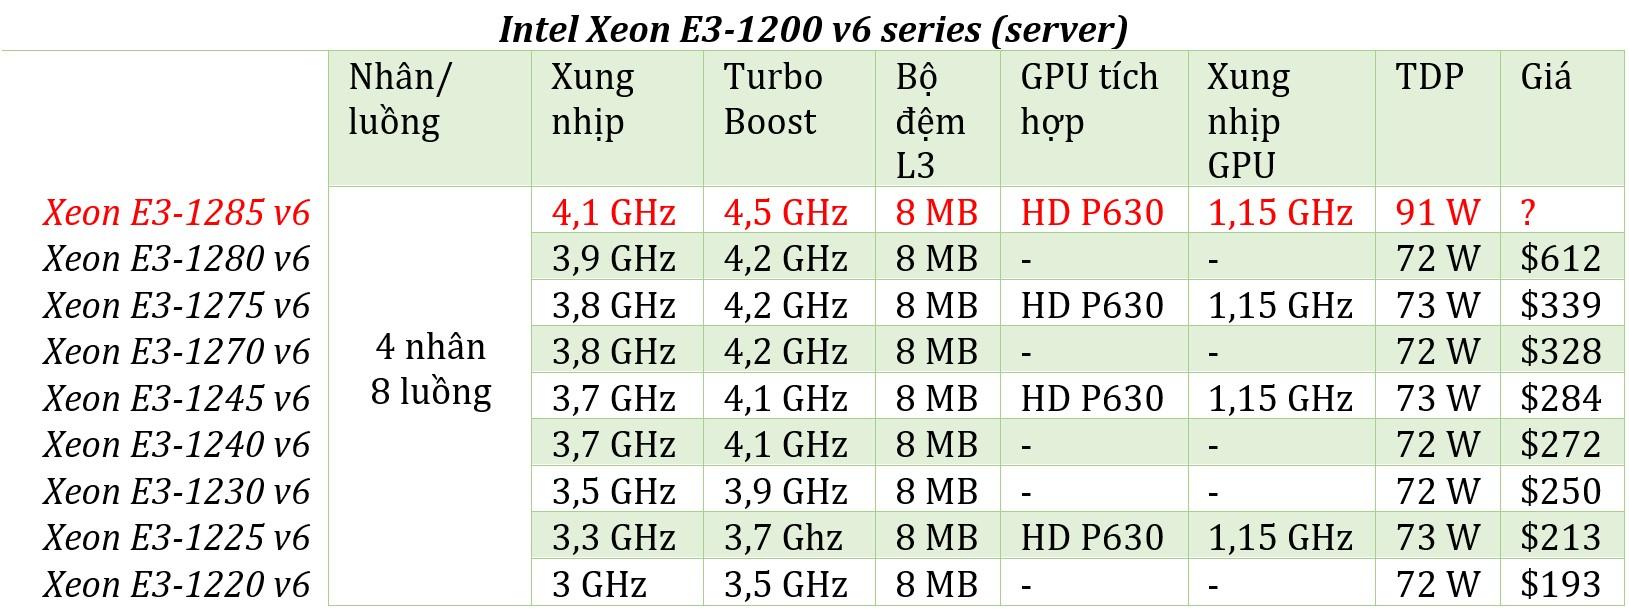 Intel Xeon E3-1200 v6 server.jpg